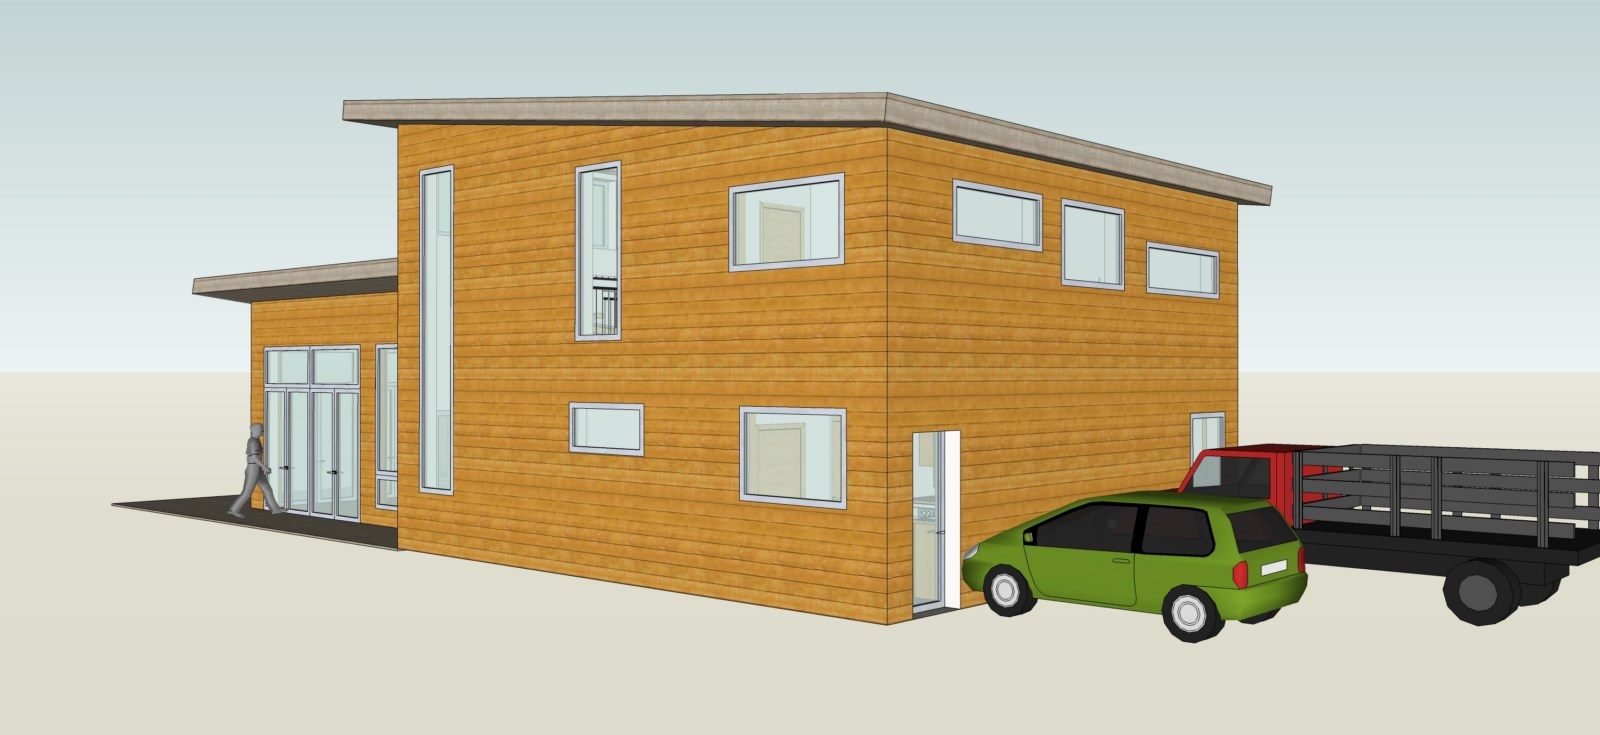 d-toit deux pentes 1.3 [1600x1200].jpg